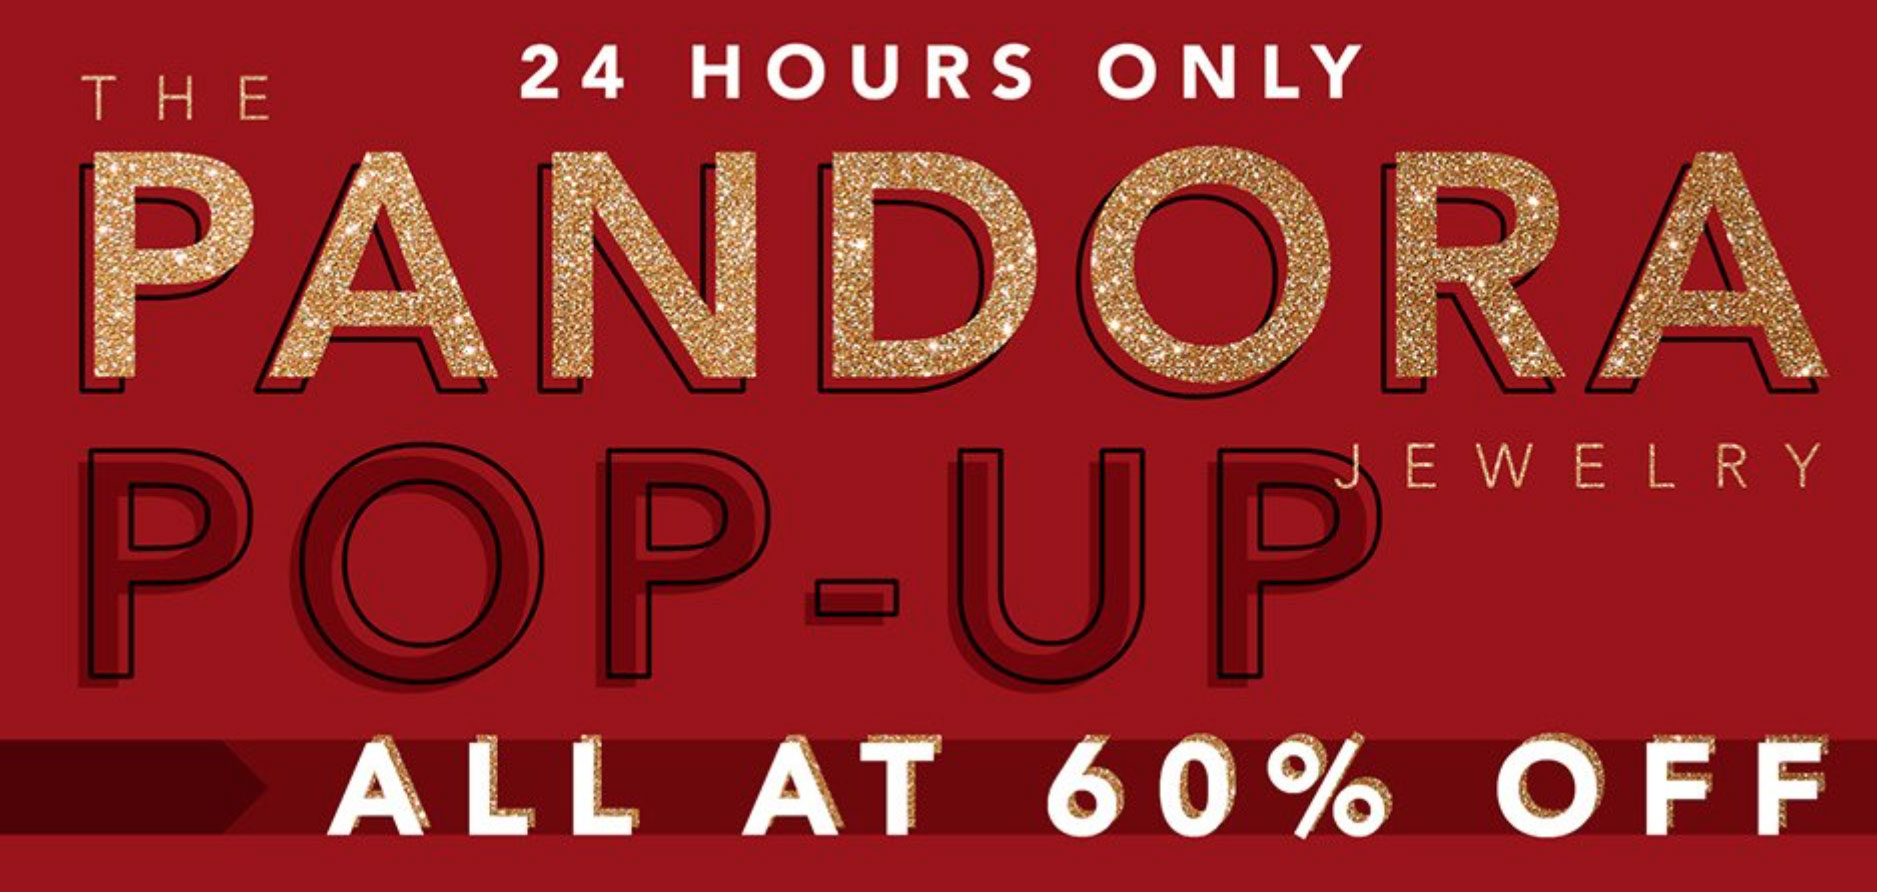 ede29c532 Rue La La 60% off PANDORA Sale - The Art of Pandora | More than just ...